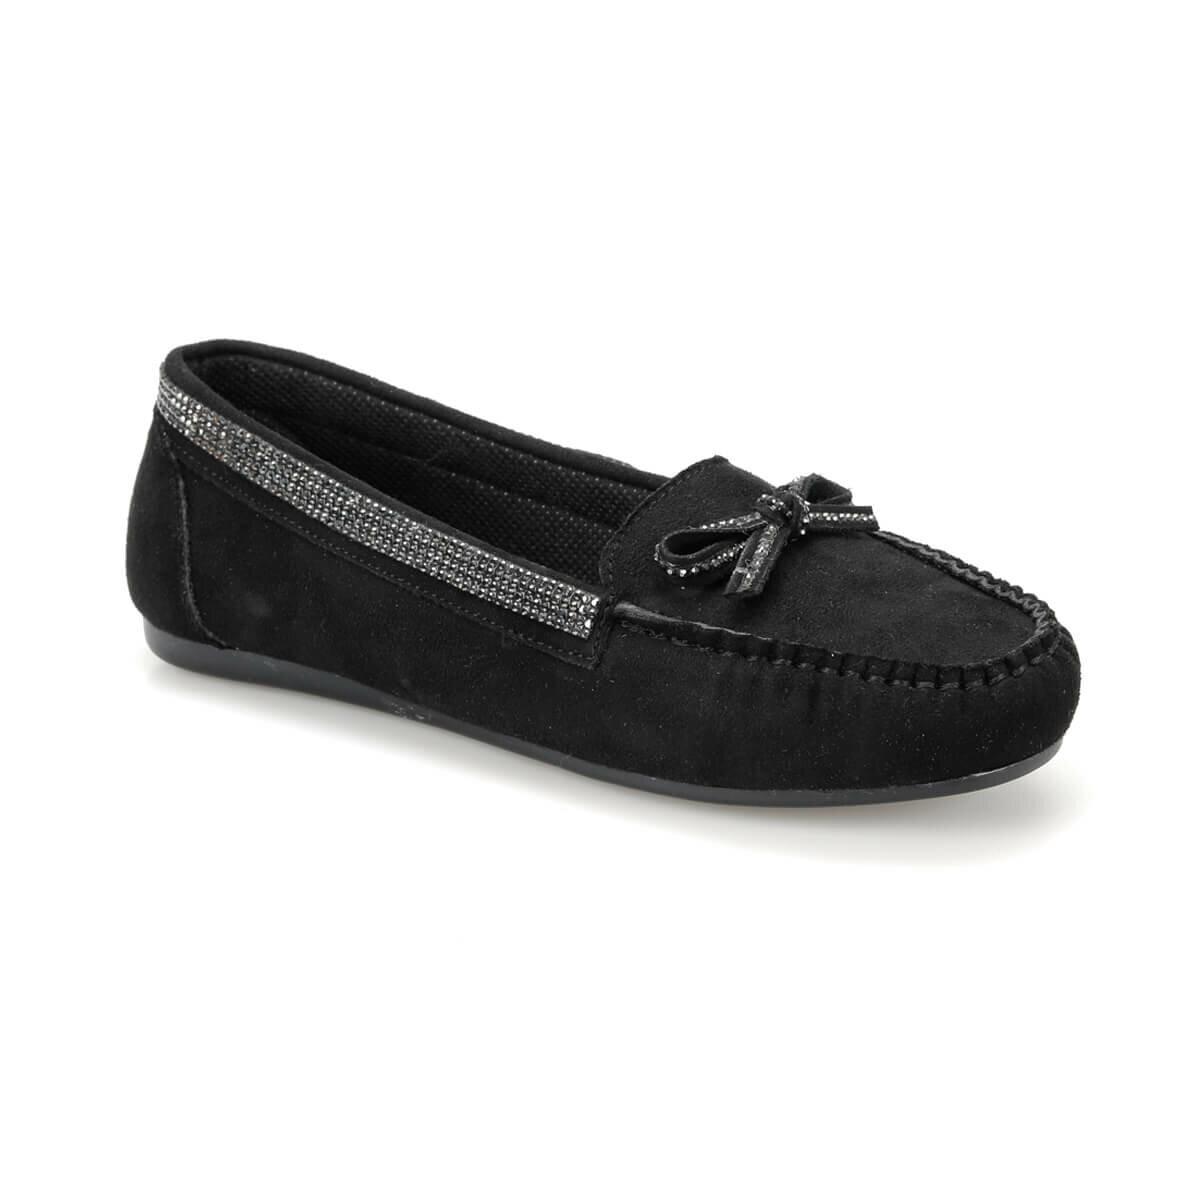 FLO DS19034 Black Women Loafer Shoes Miss F